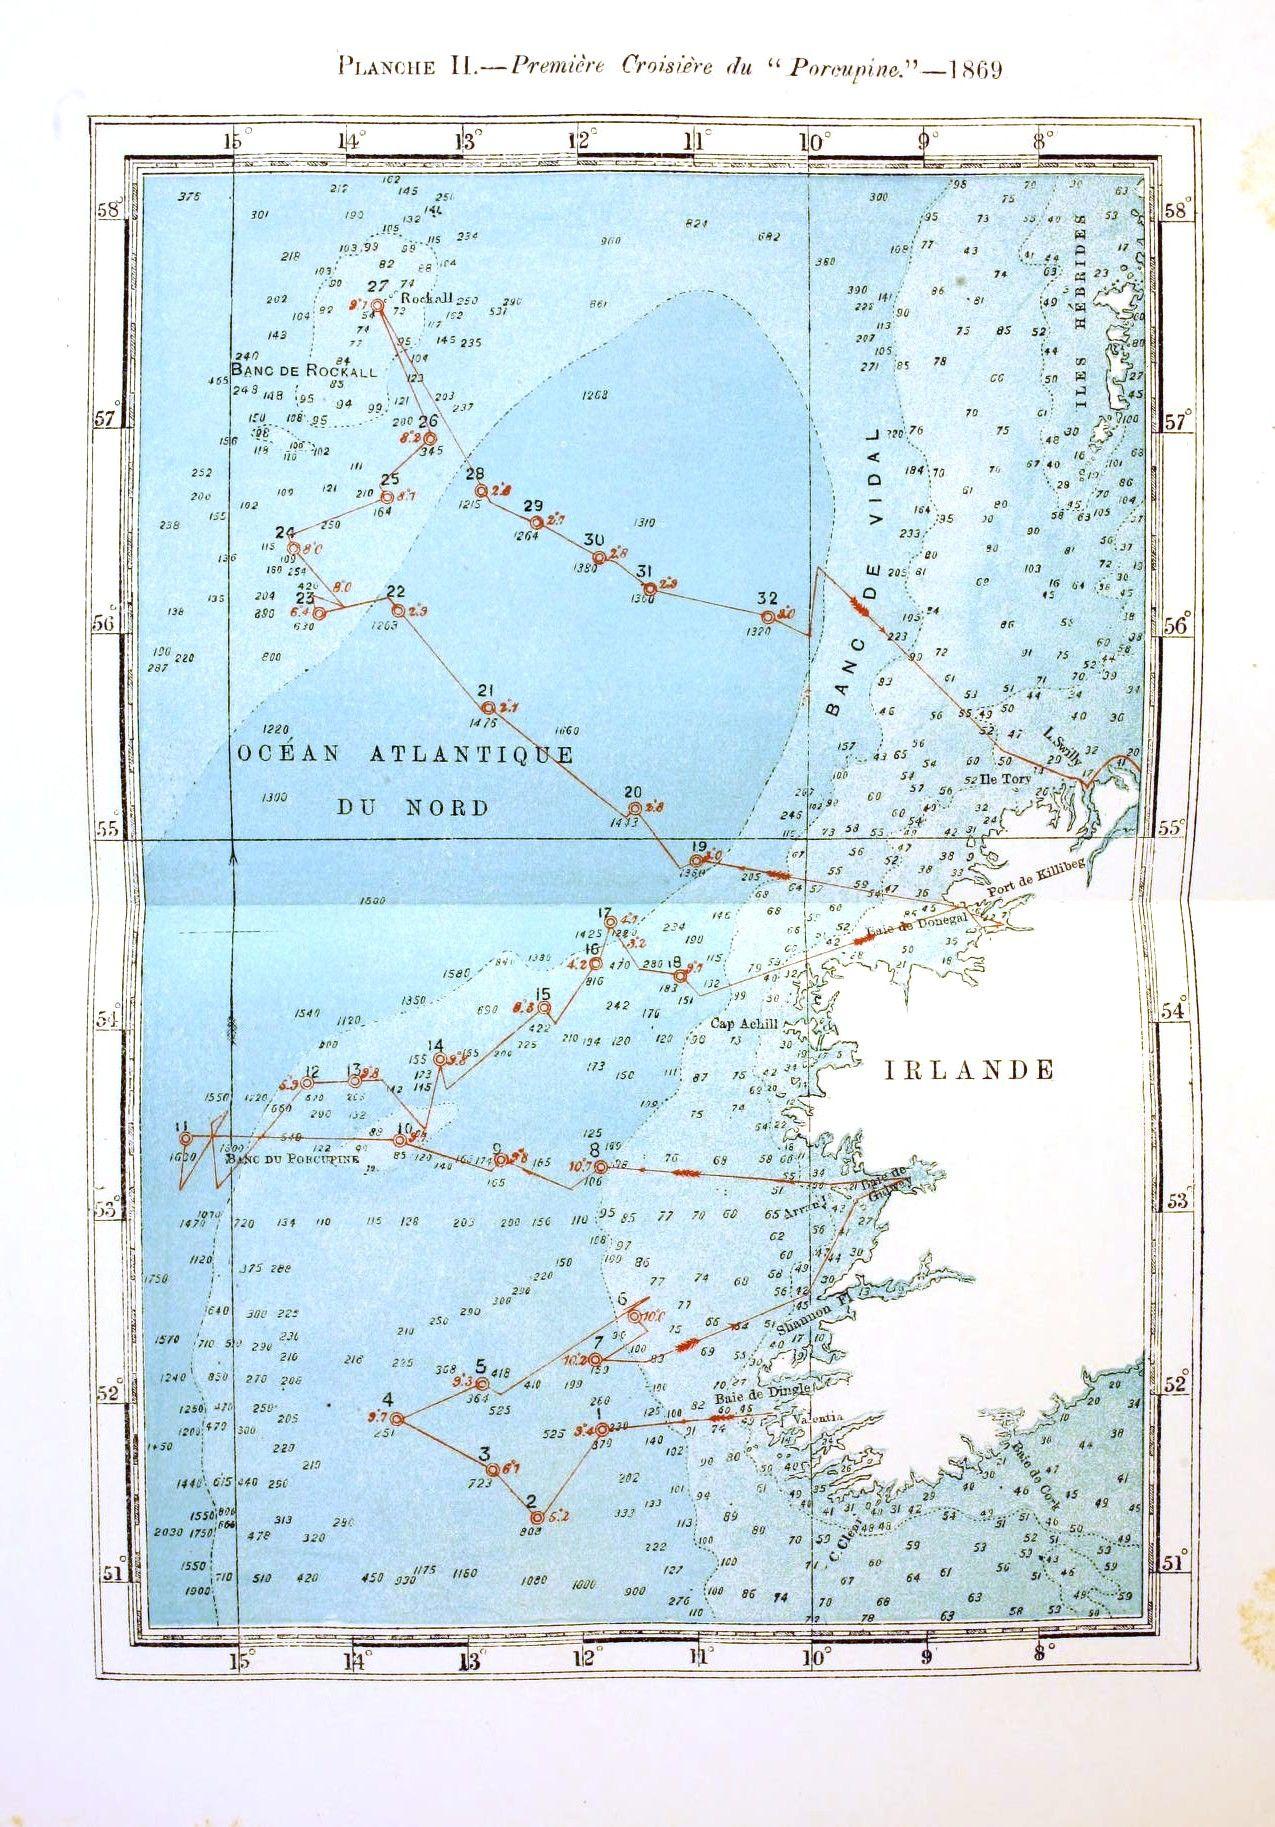 Vintage nautical map voyage of the porcupine maps pinterest